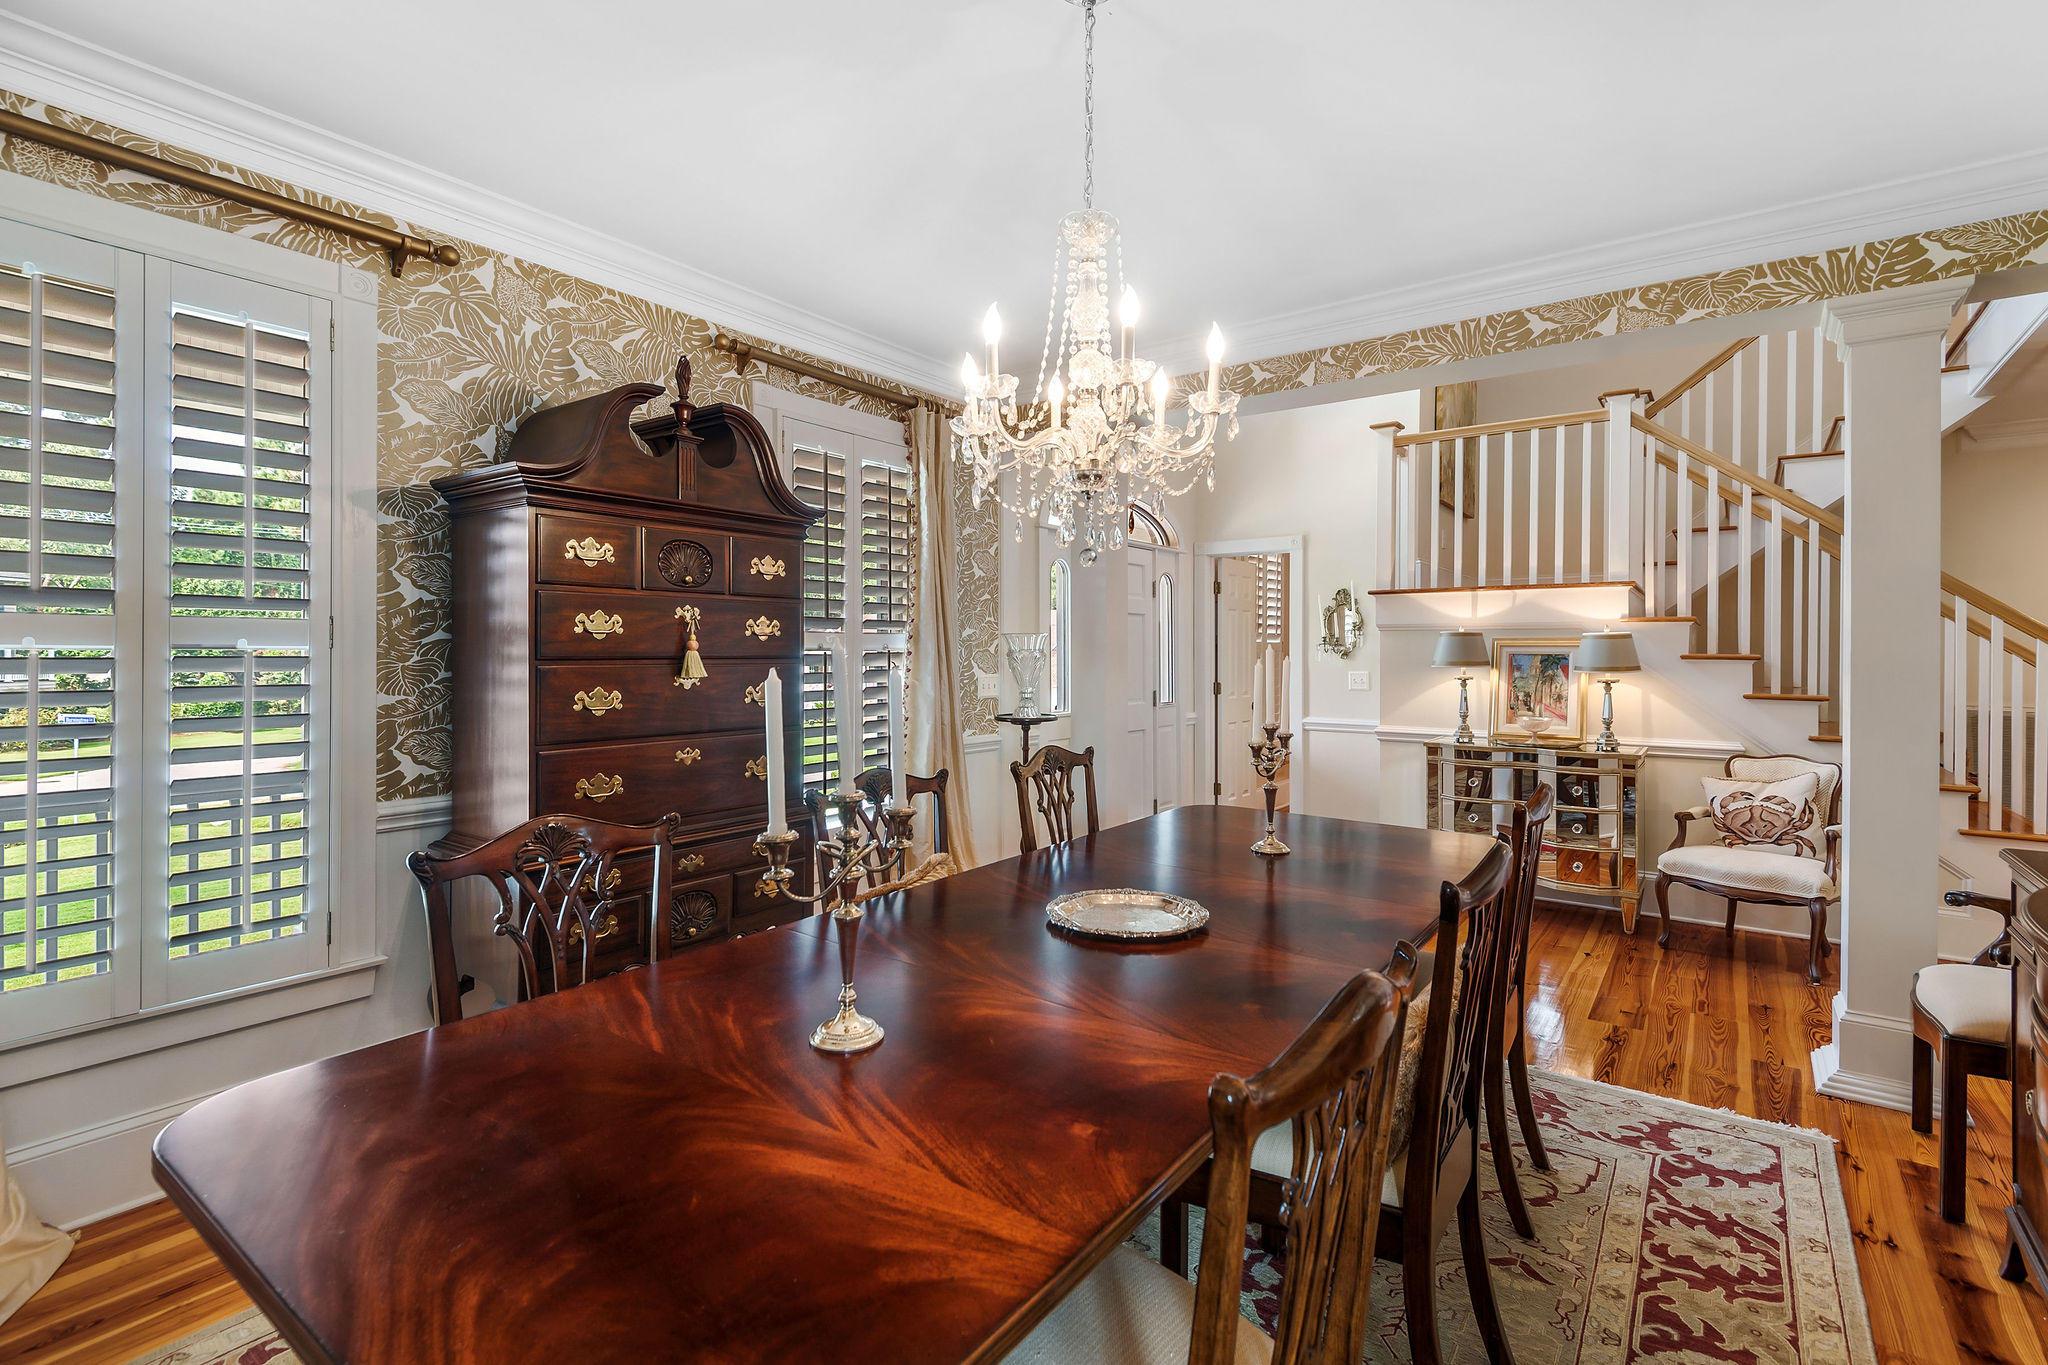 Country Club II Homes For Sale - 1482 Burningtree, Charleston, SC - 56